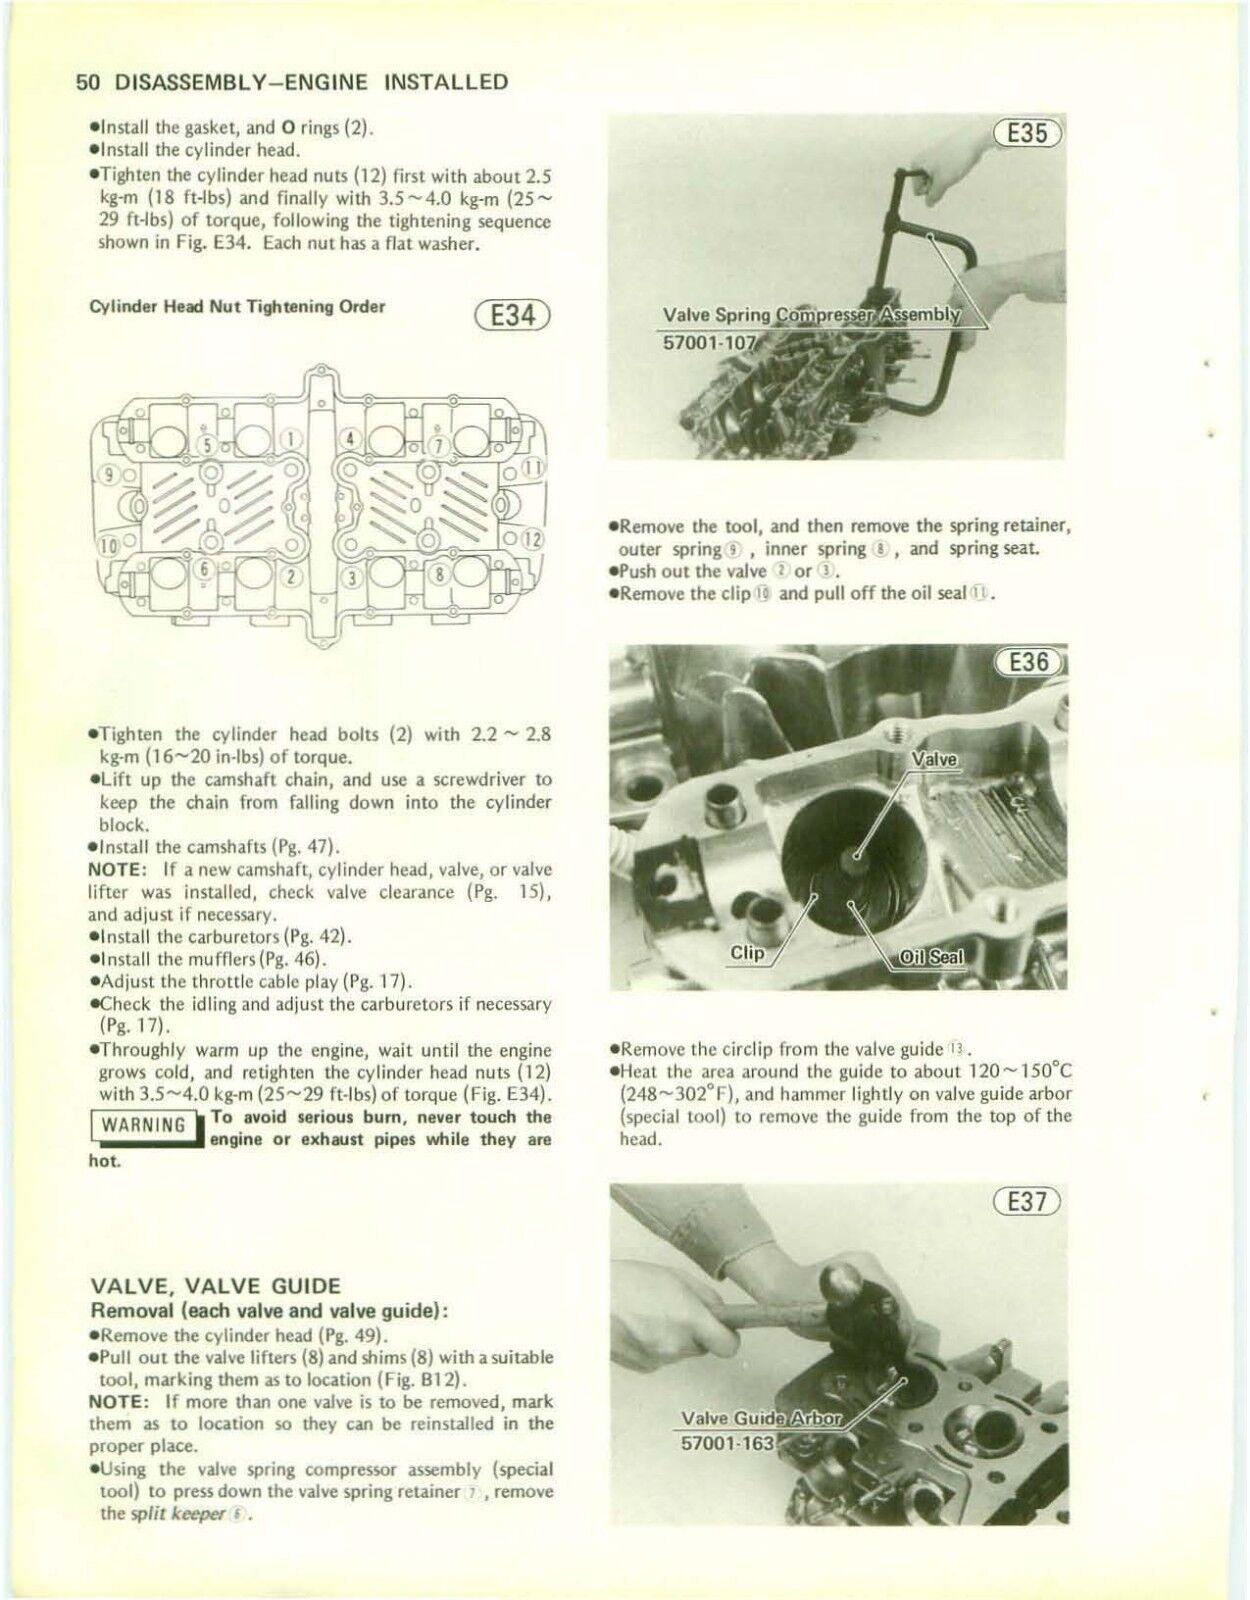 Kz Kawasaki Factory Manual Pdf